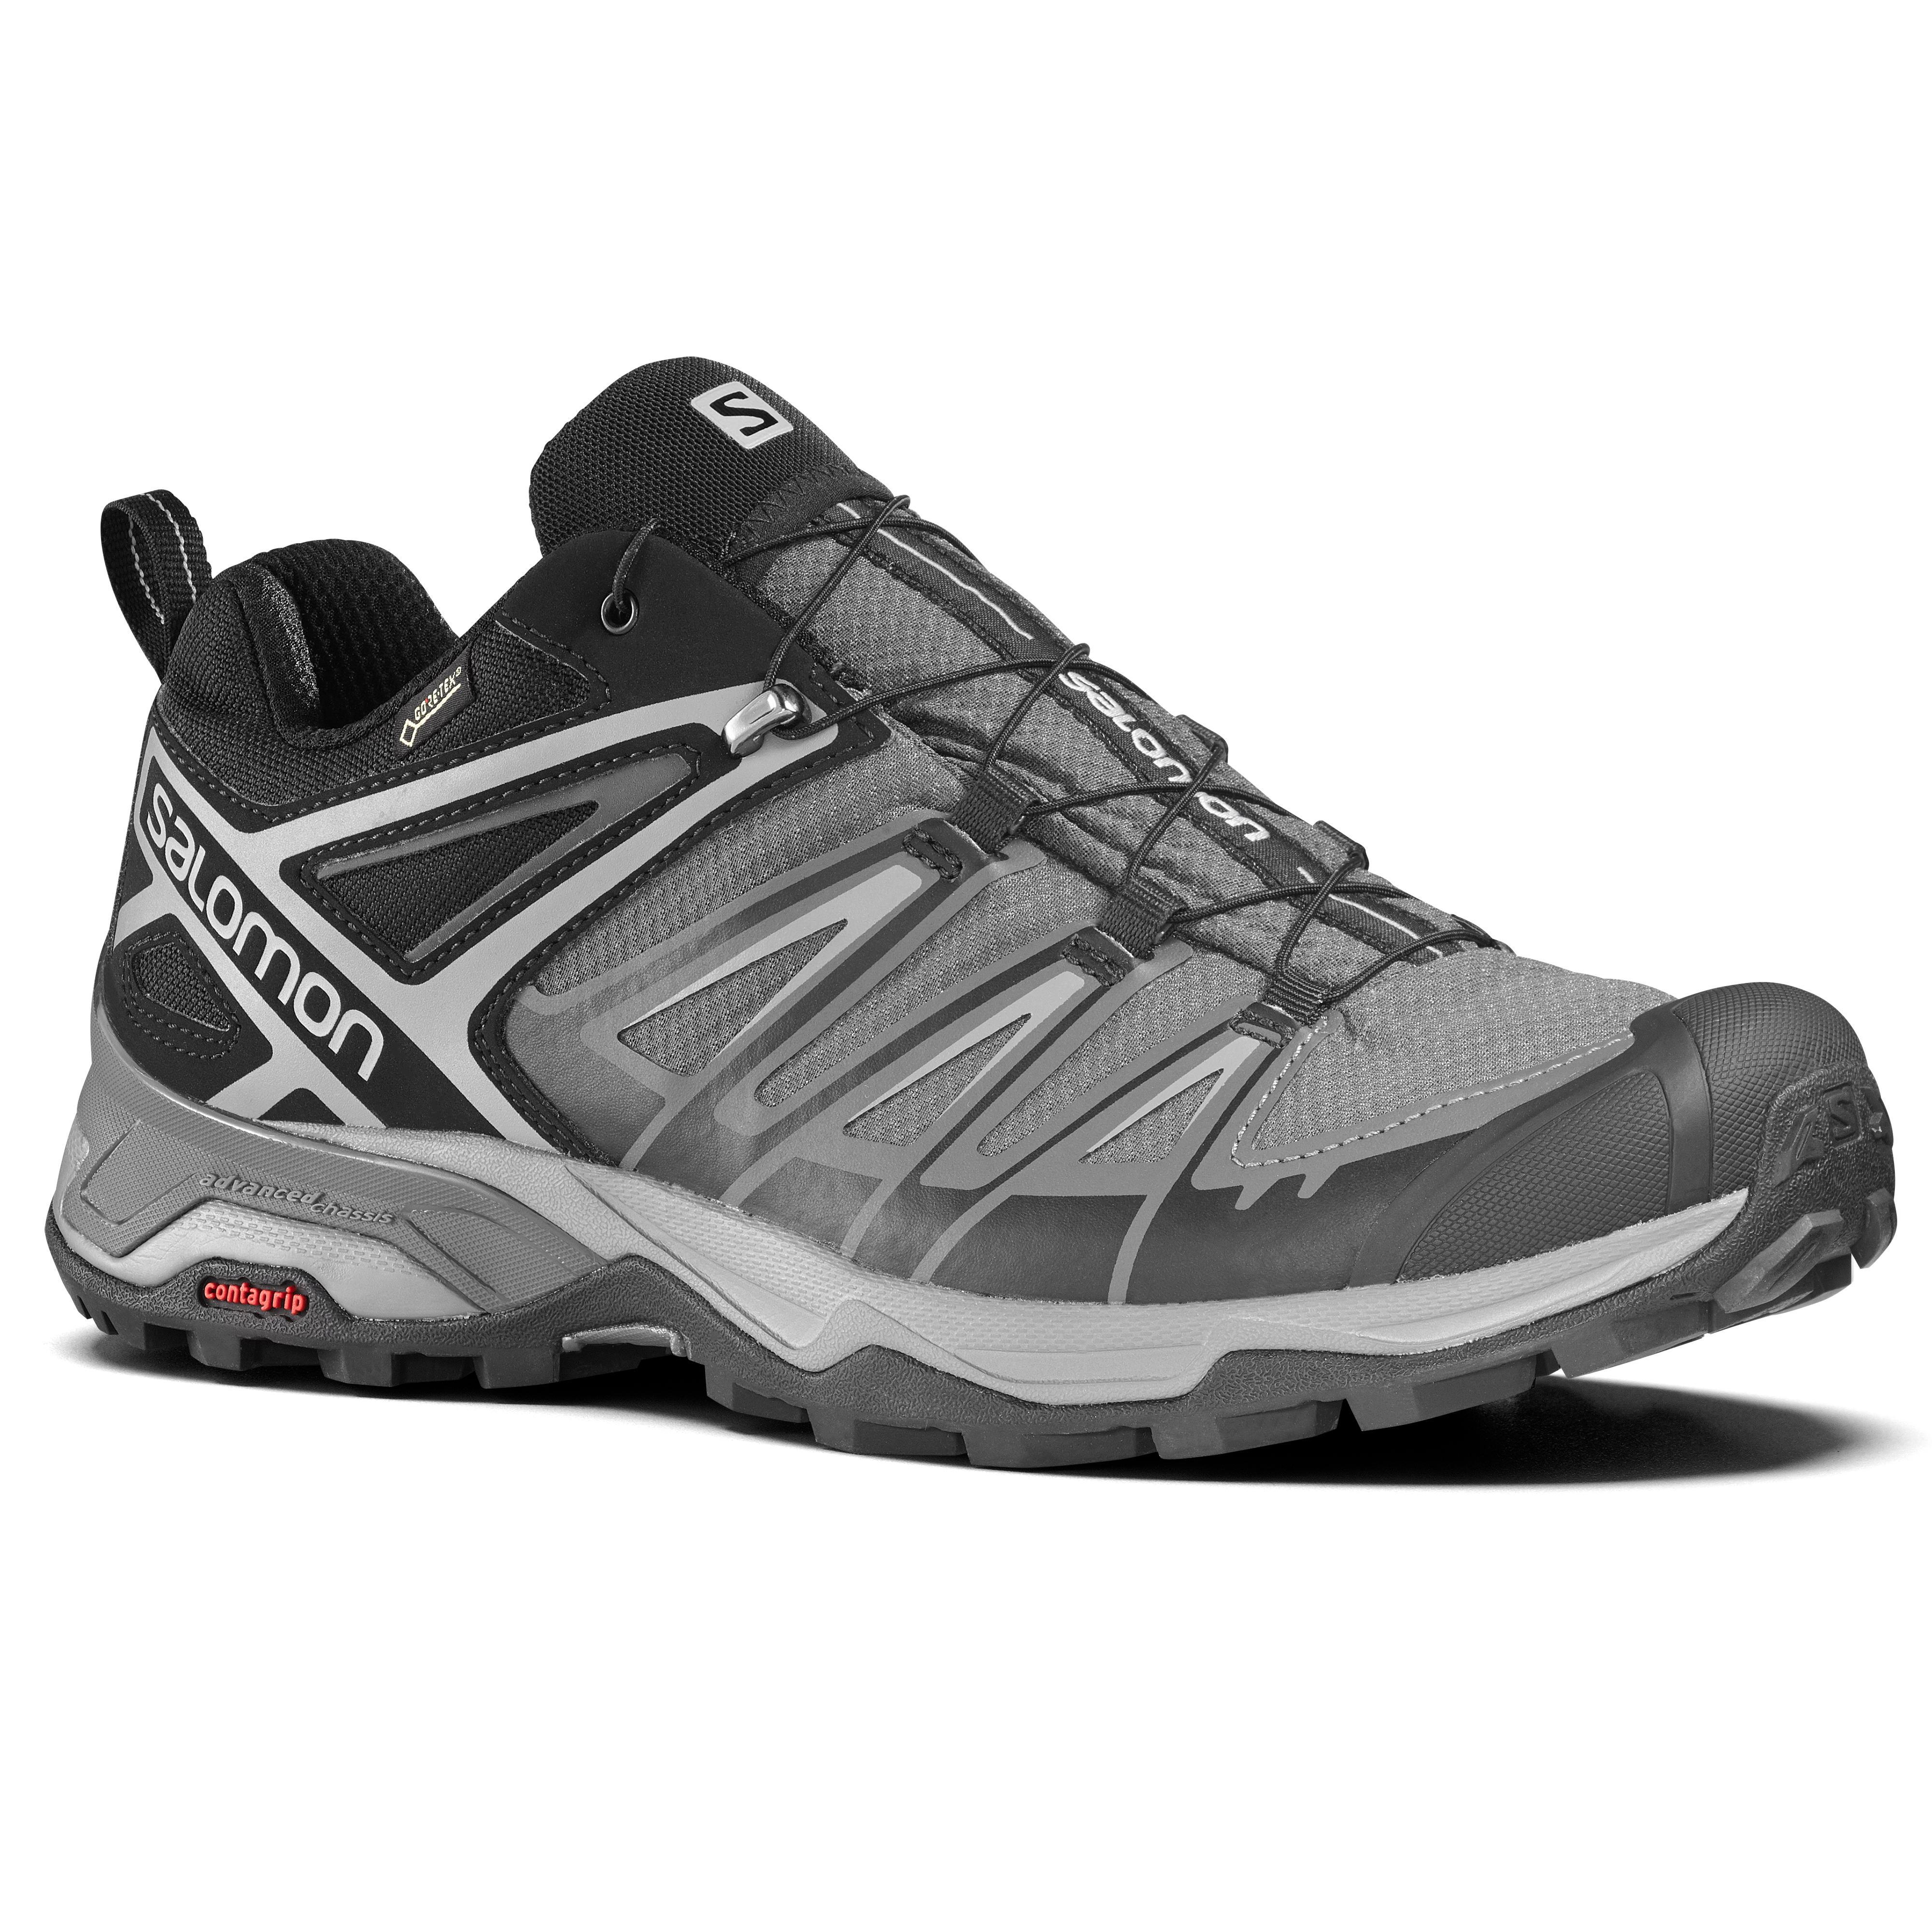 0f541b01b160a Comprar Calzado Deportivo de Hombre online